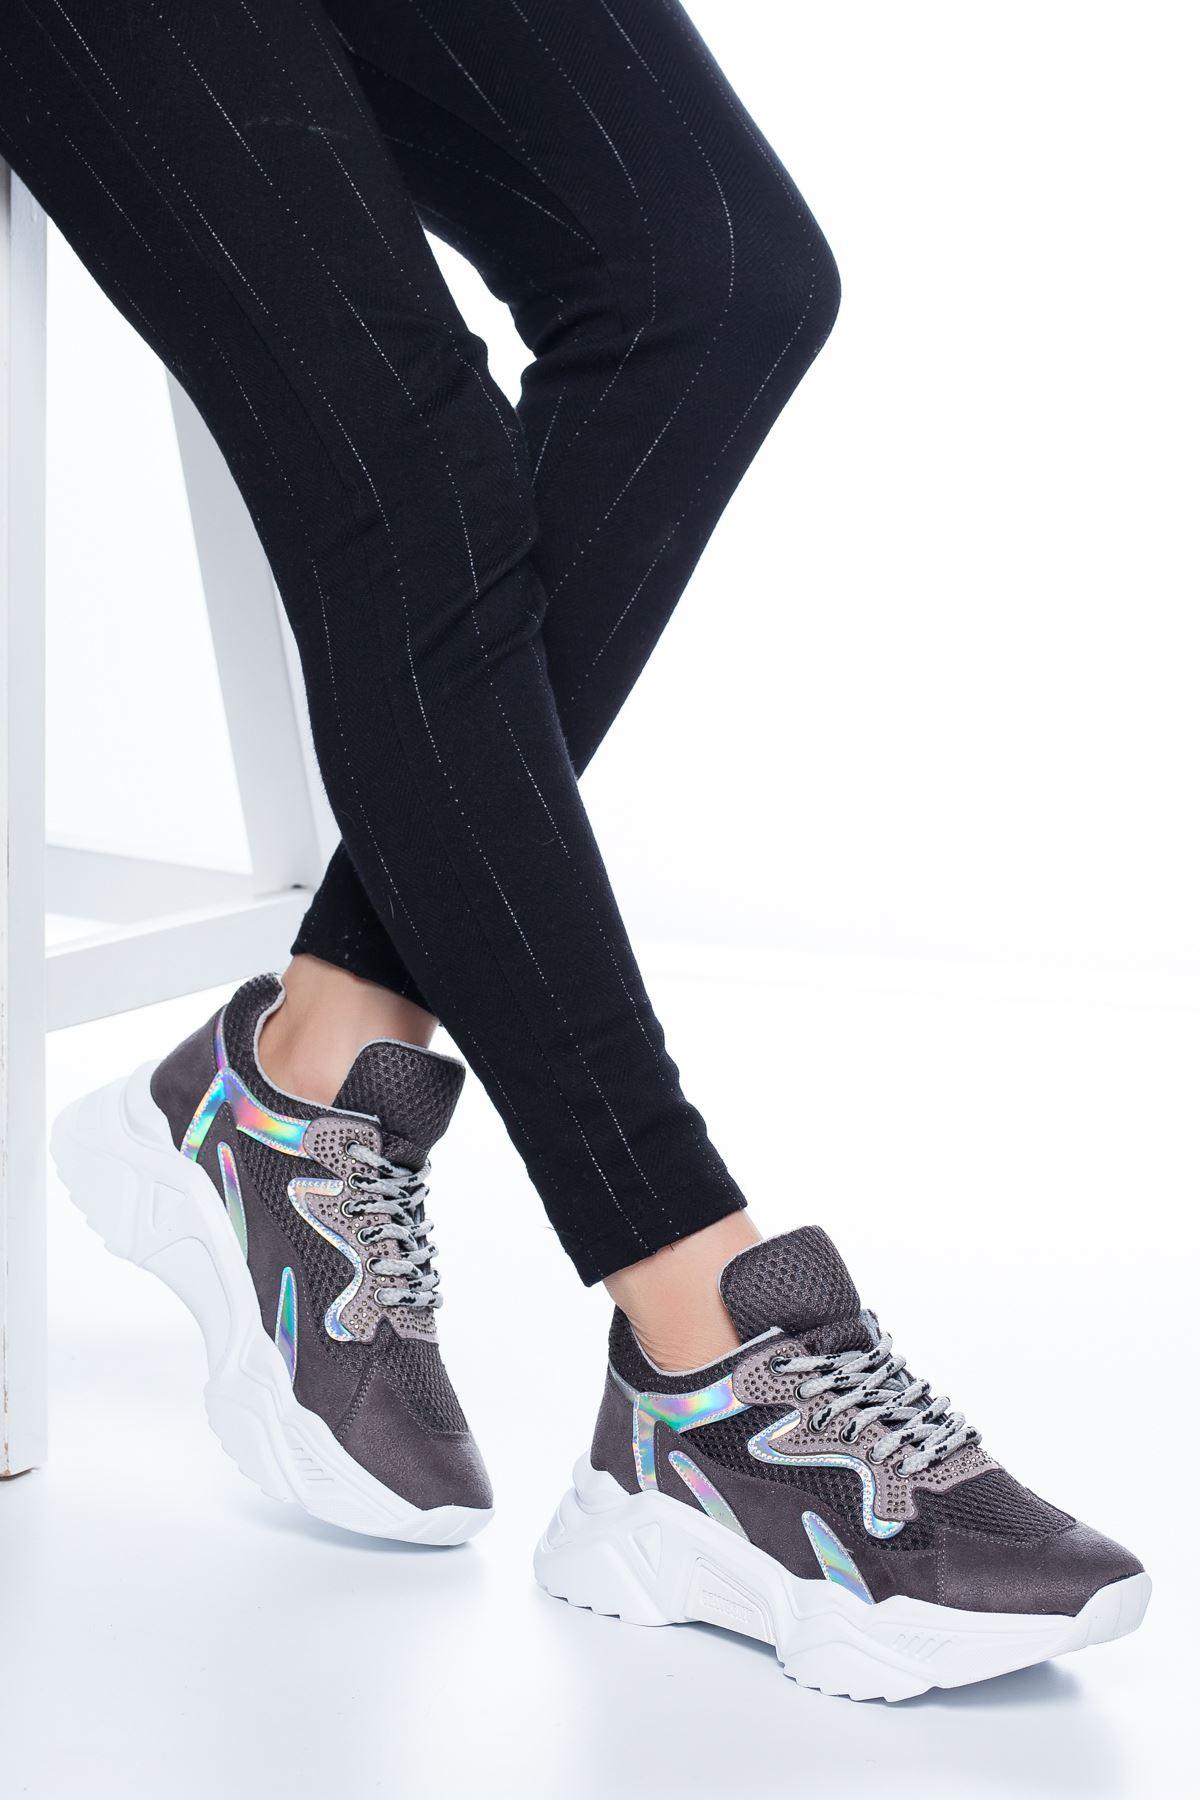 Aira File Detaylı Sneakers Füme